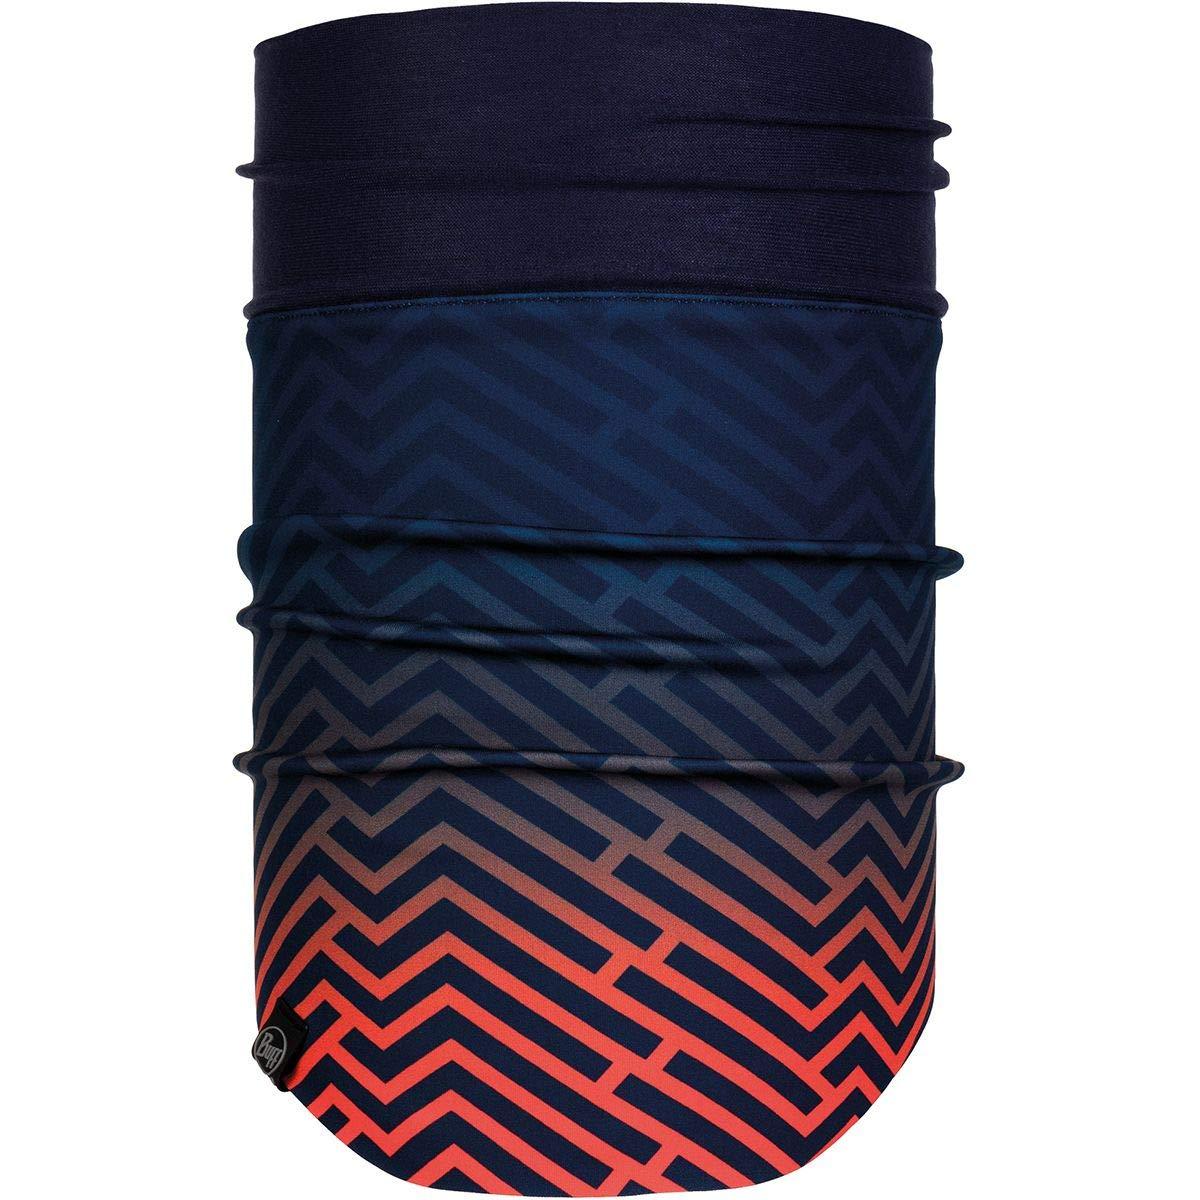 Buff Windproof Neck Warmer Arashi Black One Size Inc. Windproof Neckwarmer